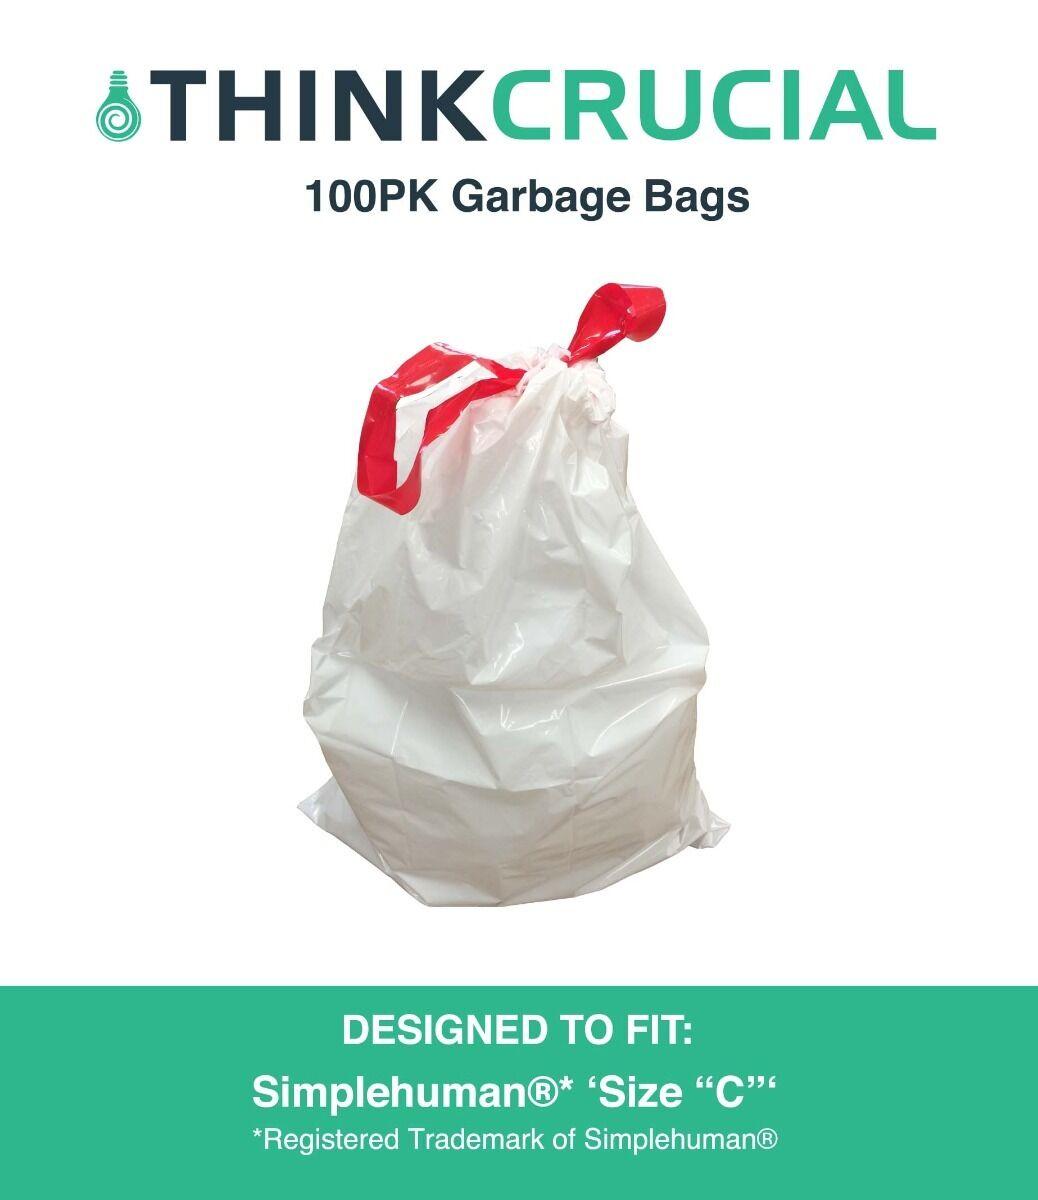 100 REPL Simplehuman® Durable Garbage Bags Größe C 10-12L   2 Gallon